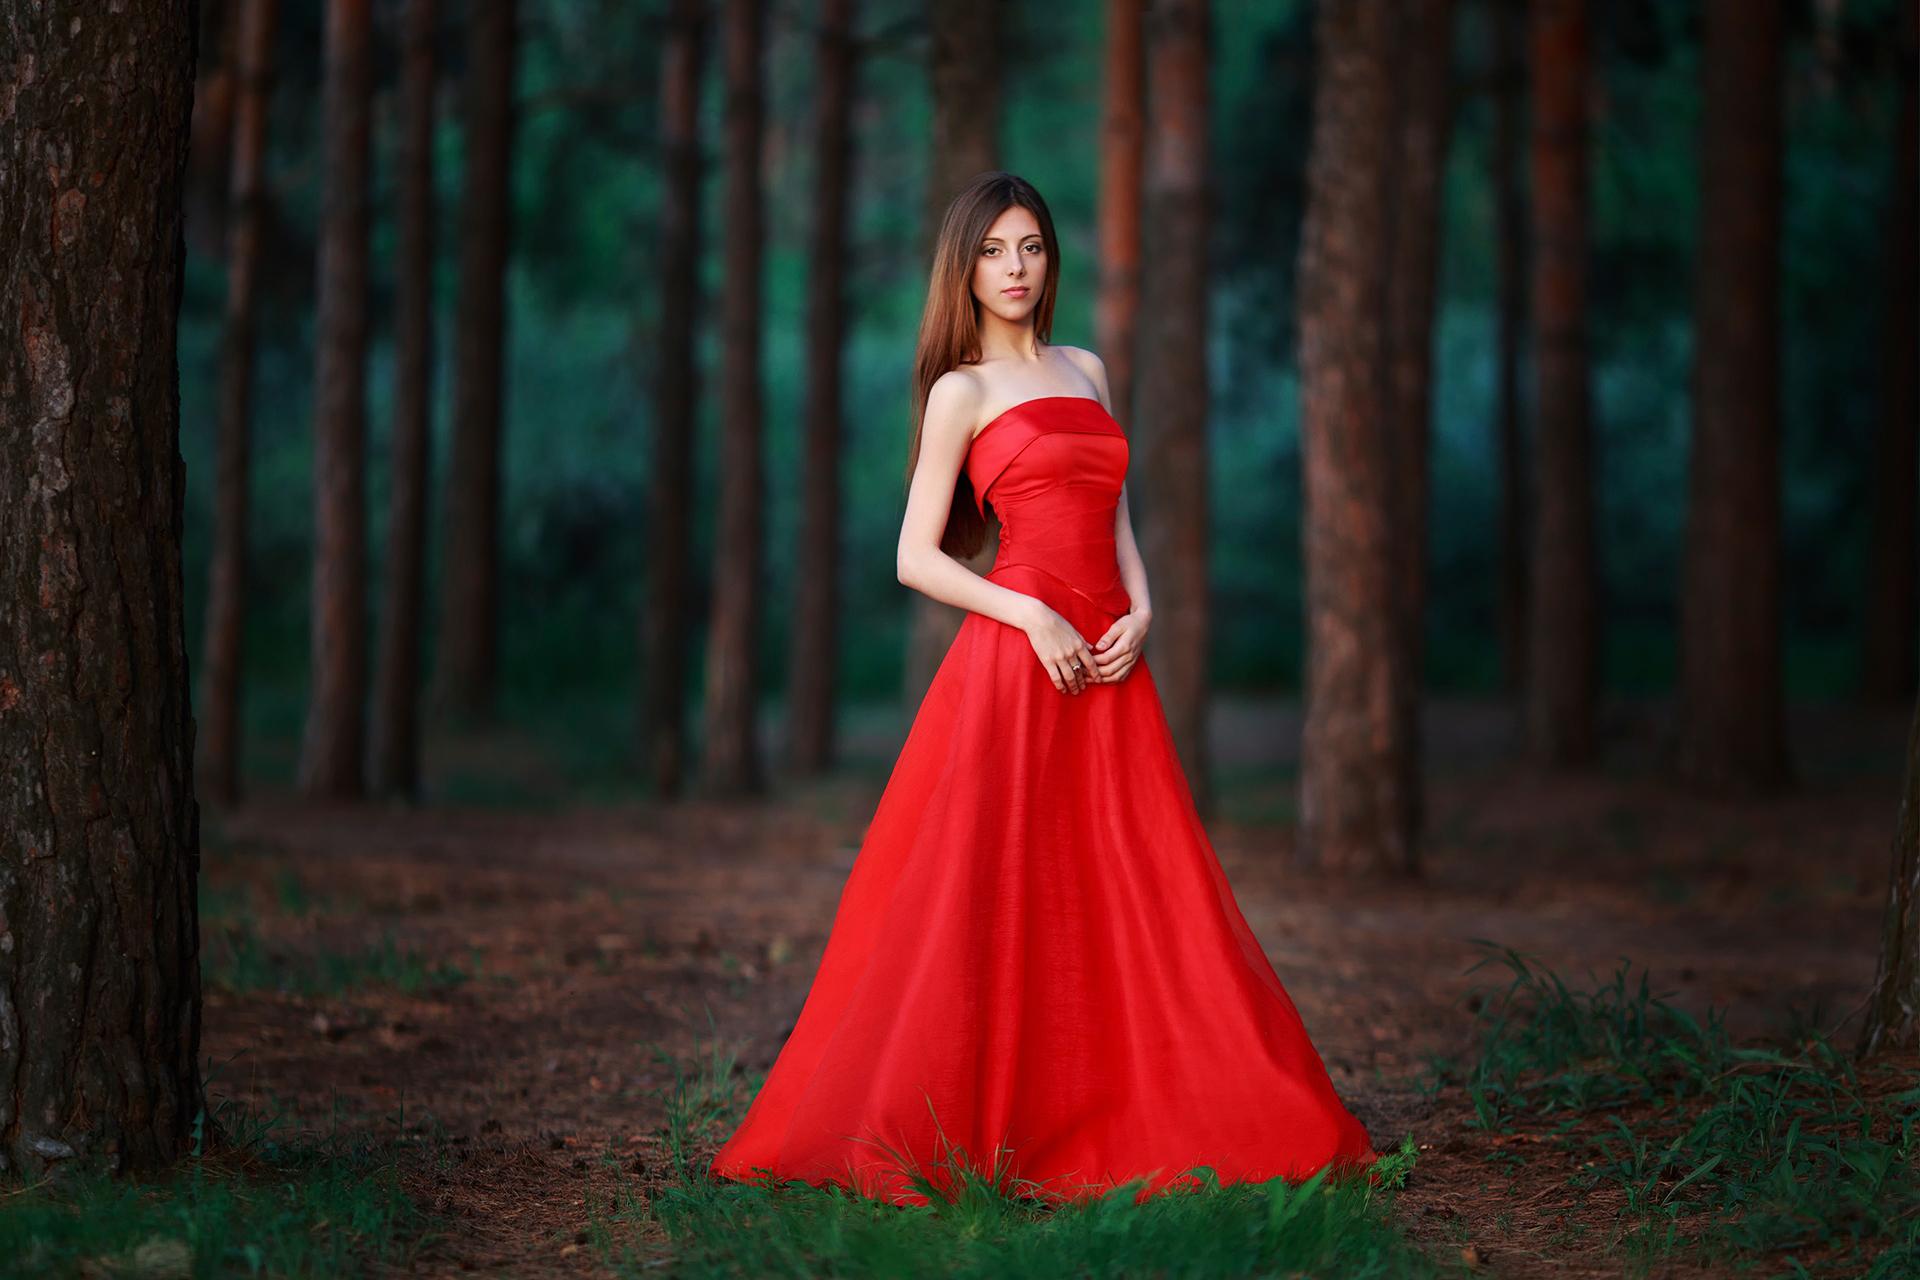 https://img3.goodfon.ru/original/1920x1280/f/61/lady-in-red-v-krasnom-les.jpg